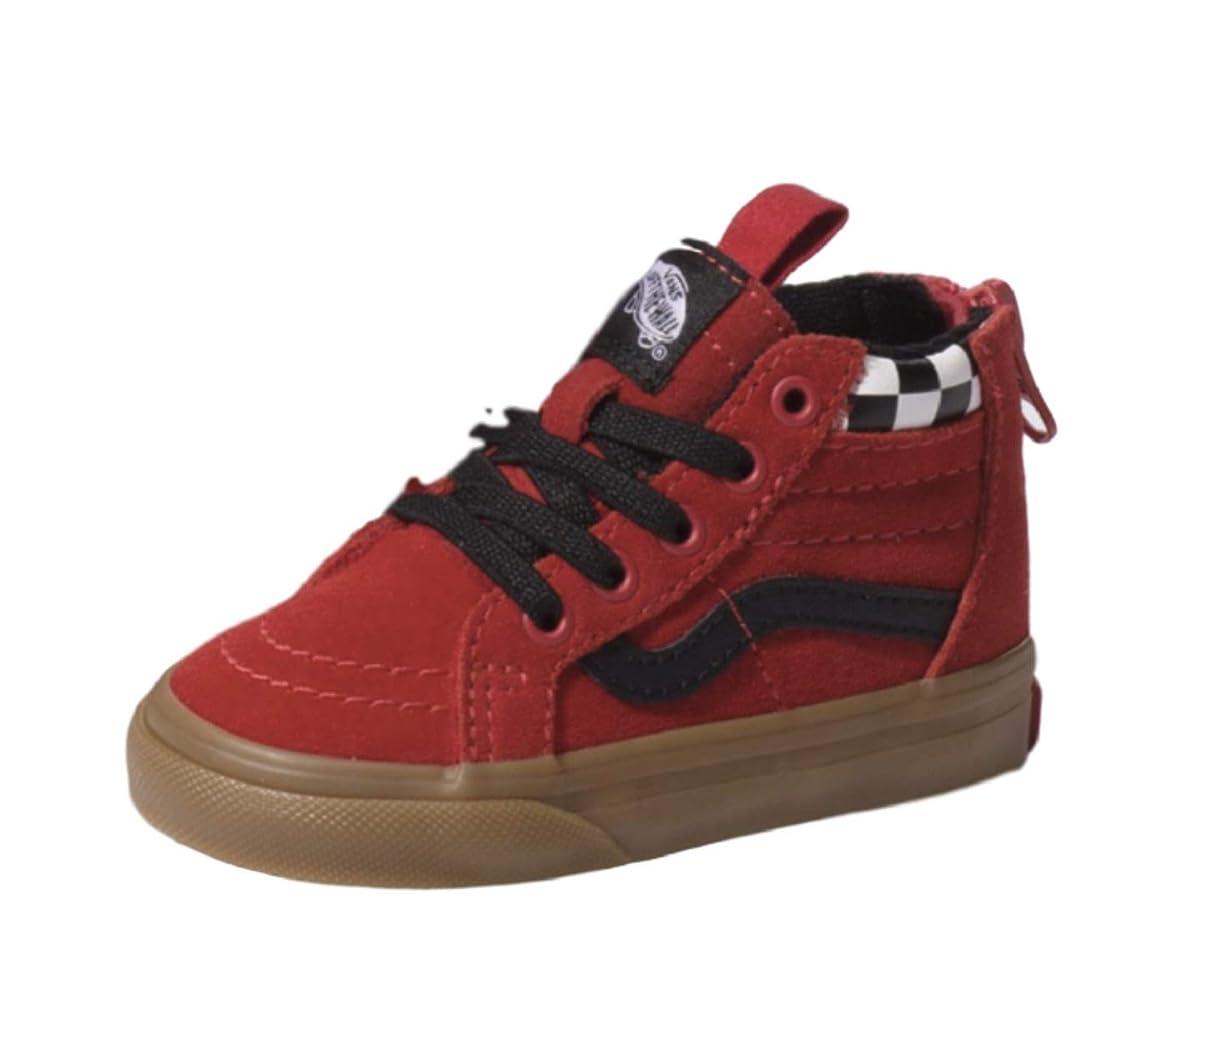 Vans Boy's Toddler's SK8-HI Zip (MTE) Checkerboard Sneaker esghp7356